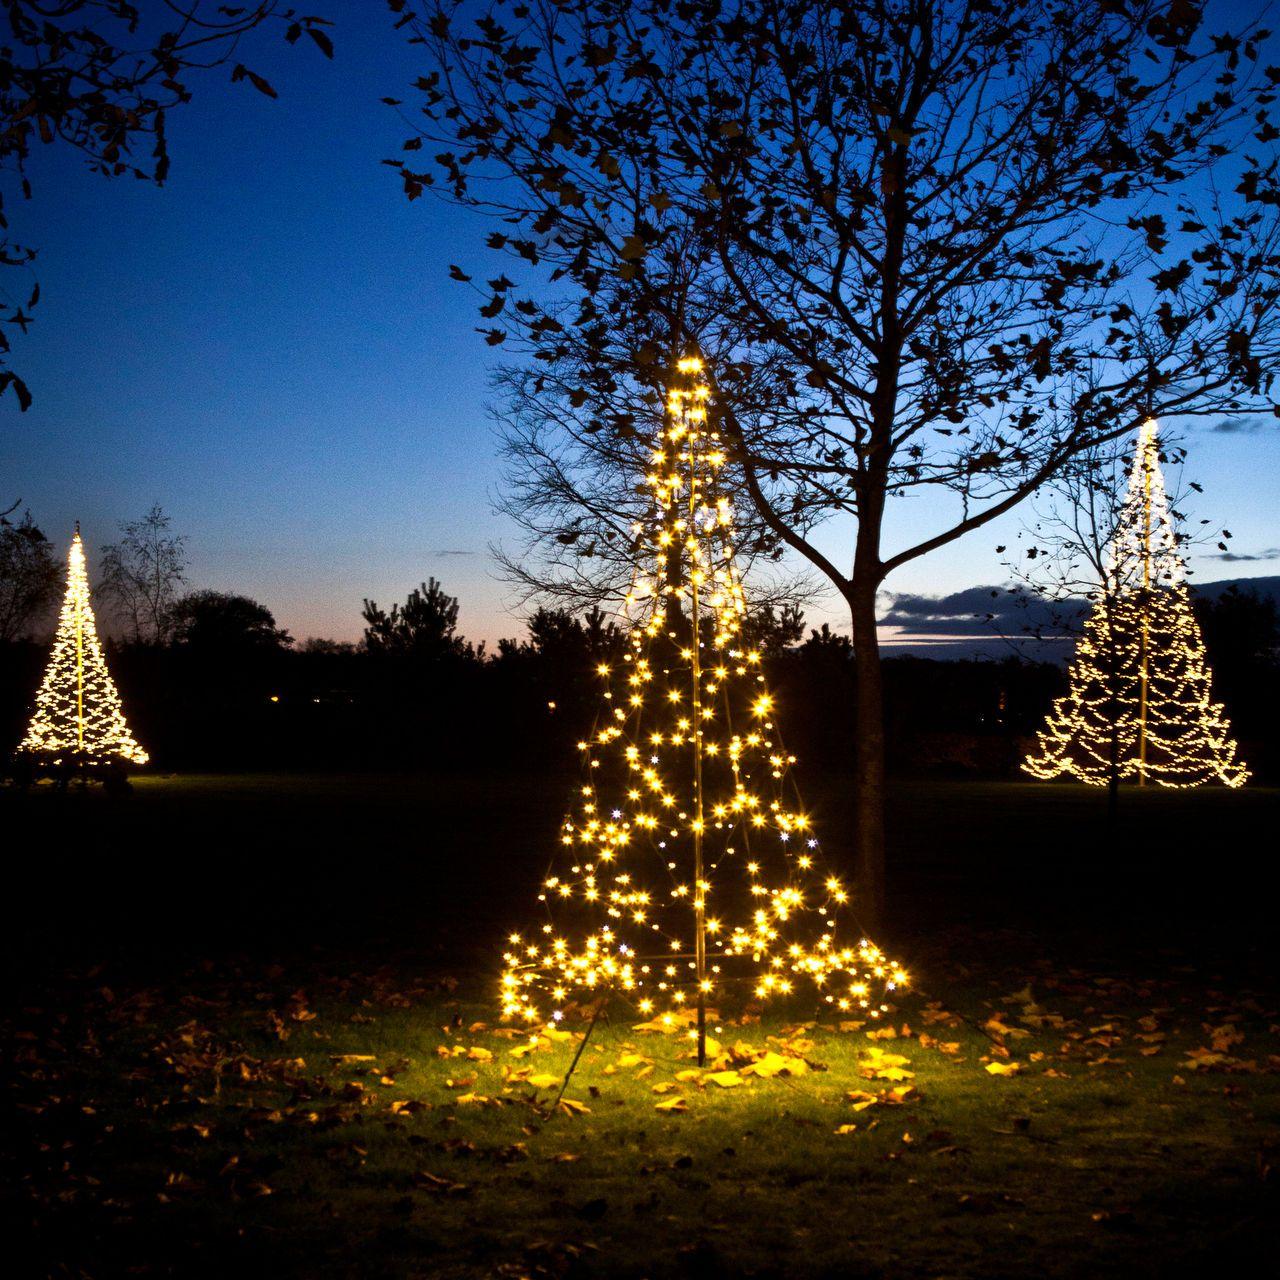 led weihnachtsb ume weihnachtsbeleuchtung aussen pinterest outdoor christmas decorations. Black Bedroom Furniture Sets. Home Design Ideas